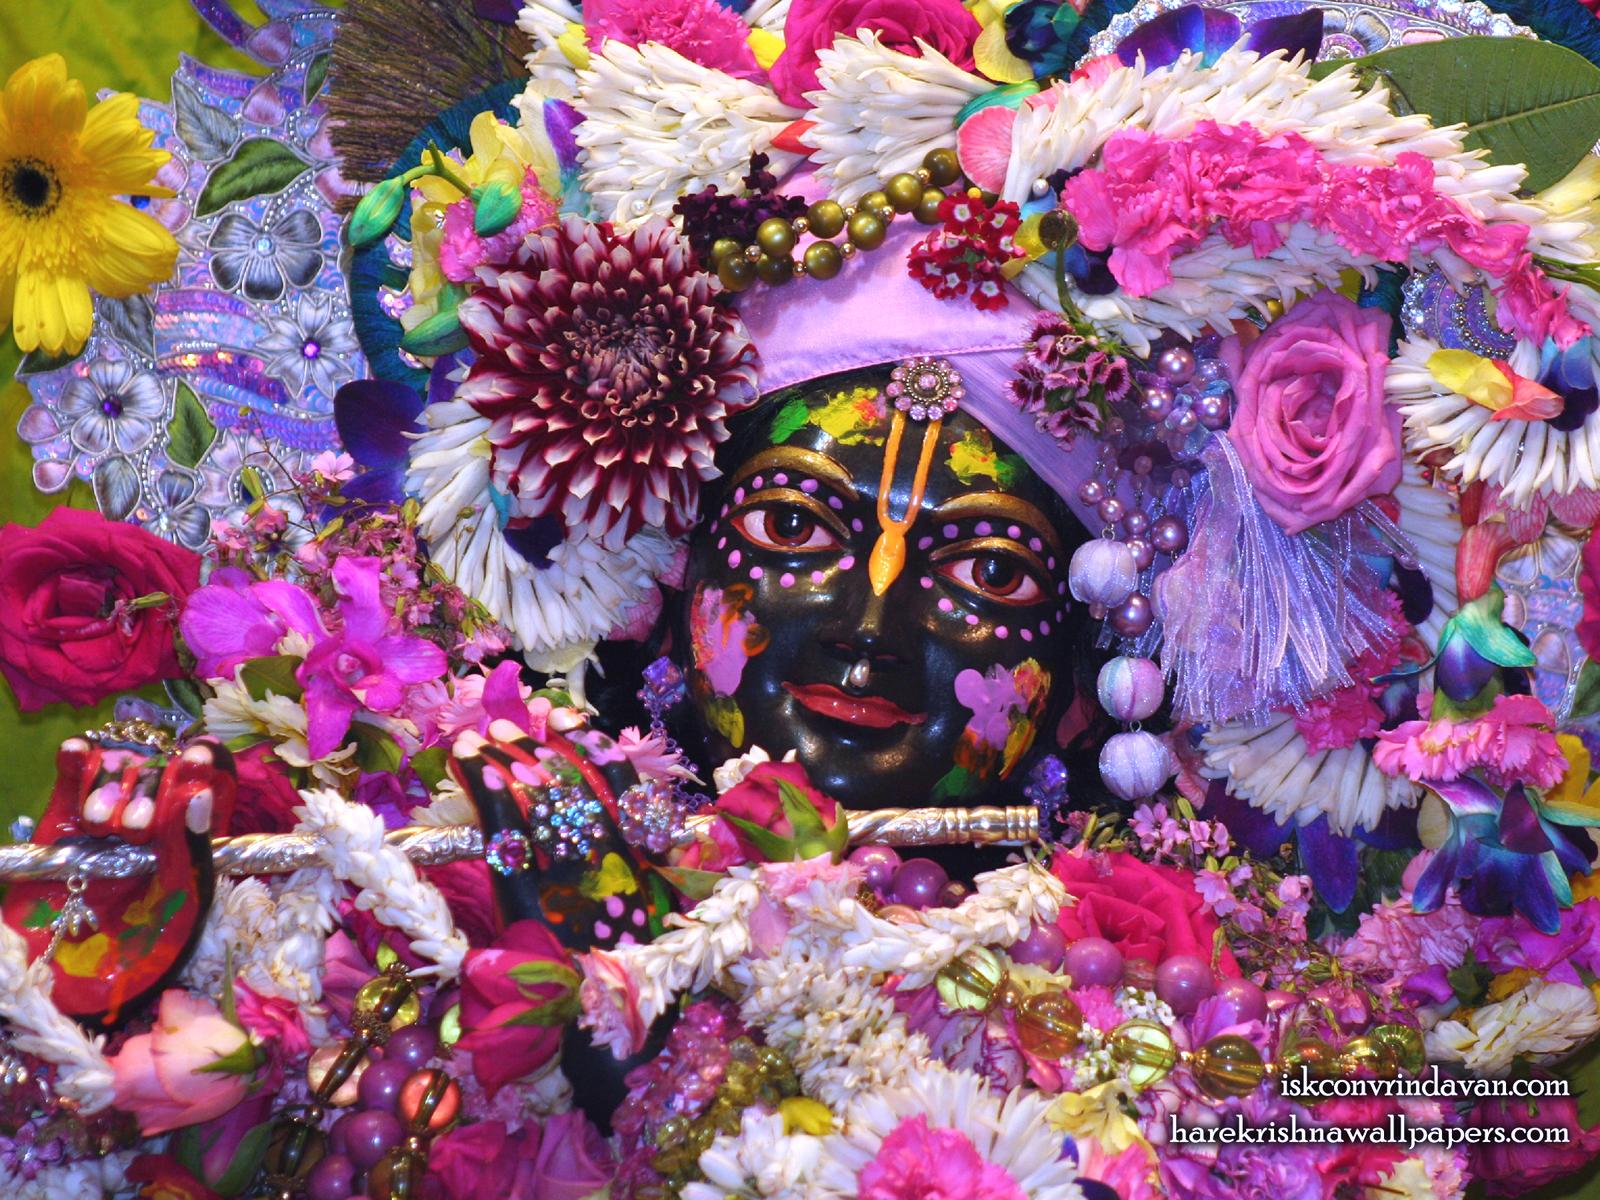 Sri Shyamsundar Close up Wallpaper (020) Size1600x1200 Download